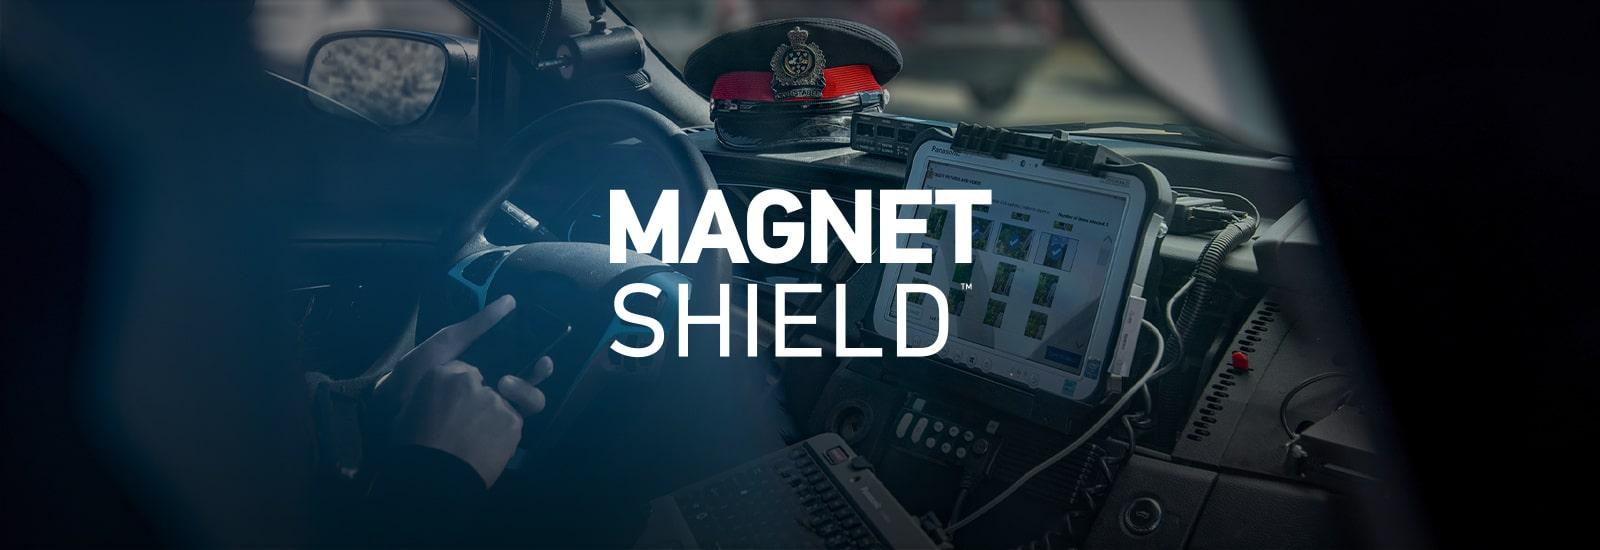 Magnet SHIELD